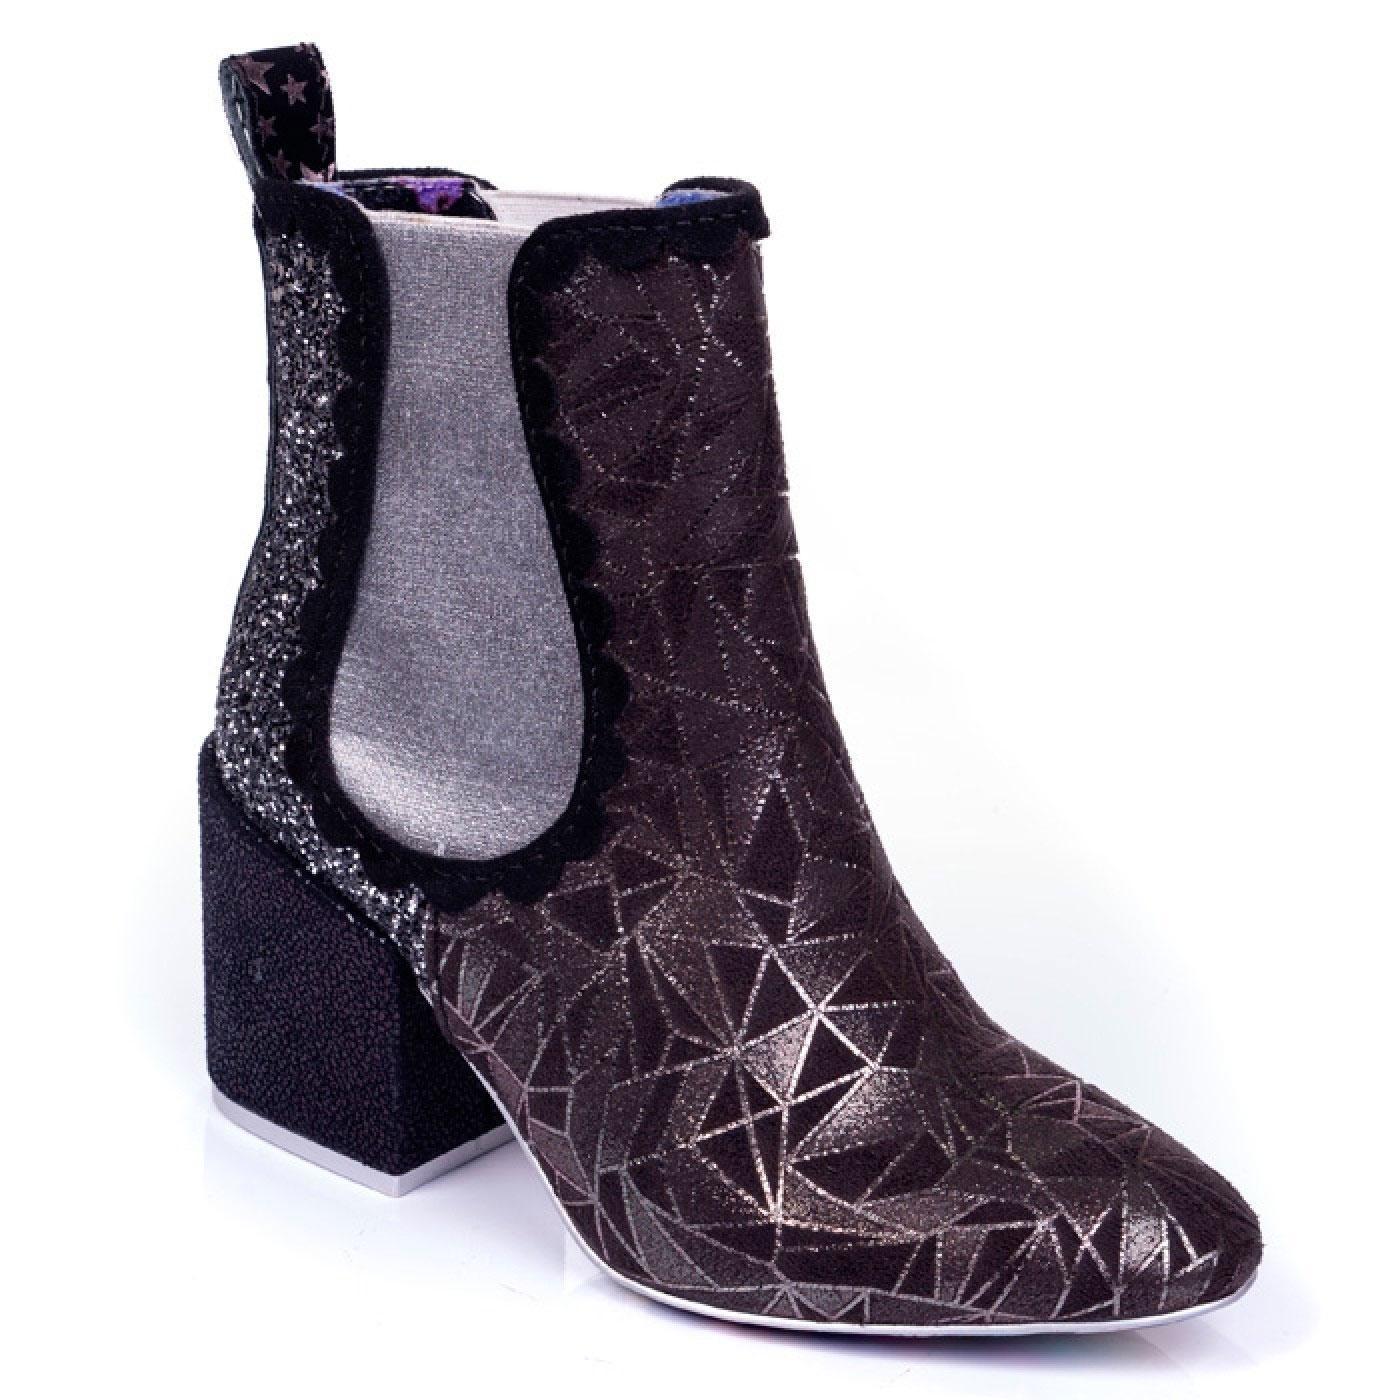 Kings Road IRREGULAR CHOICE Glitter Chelsea Boots